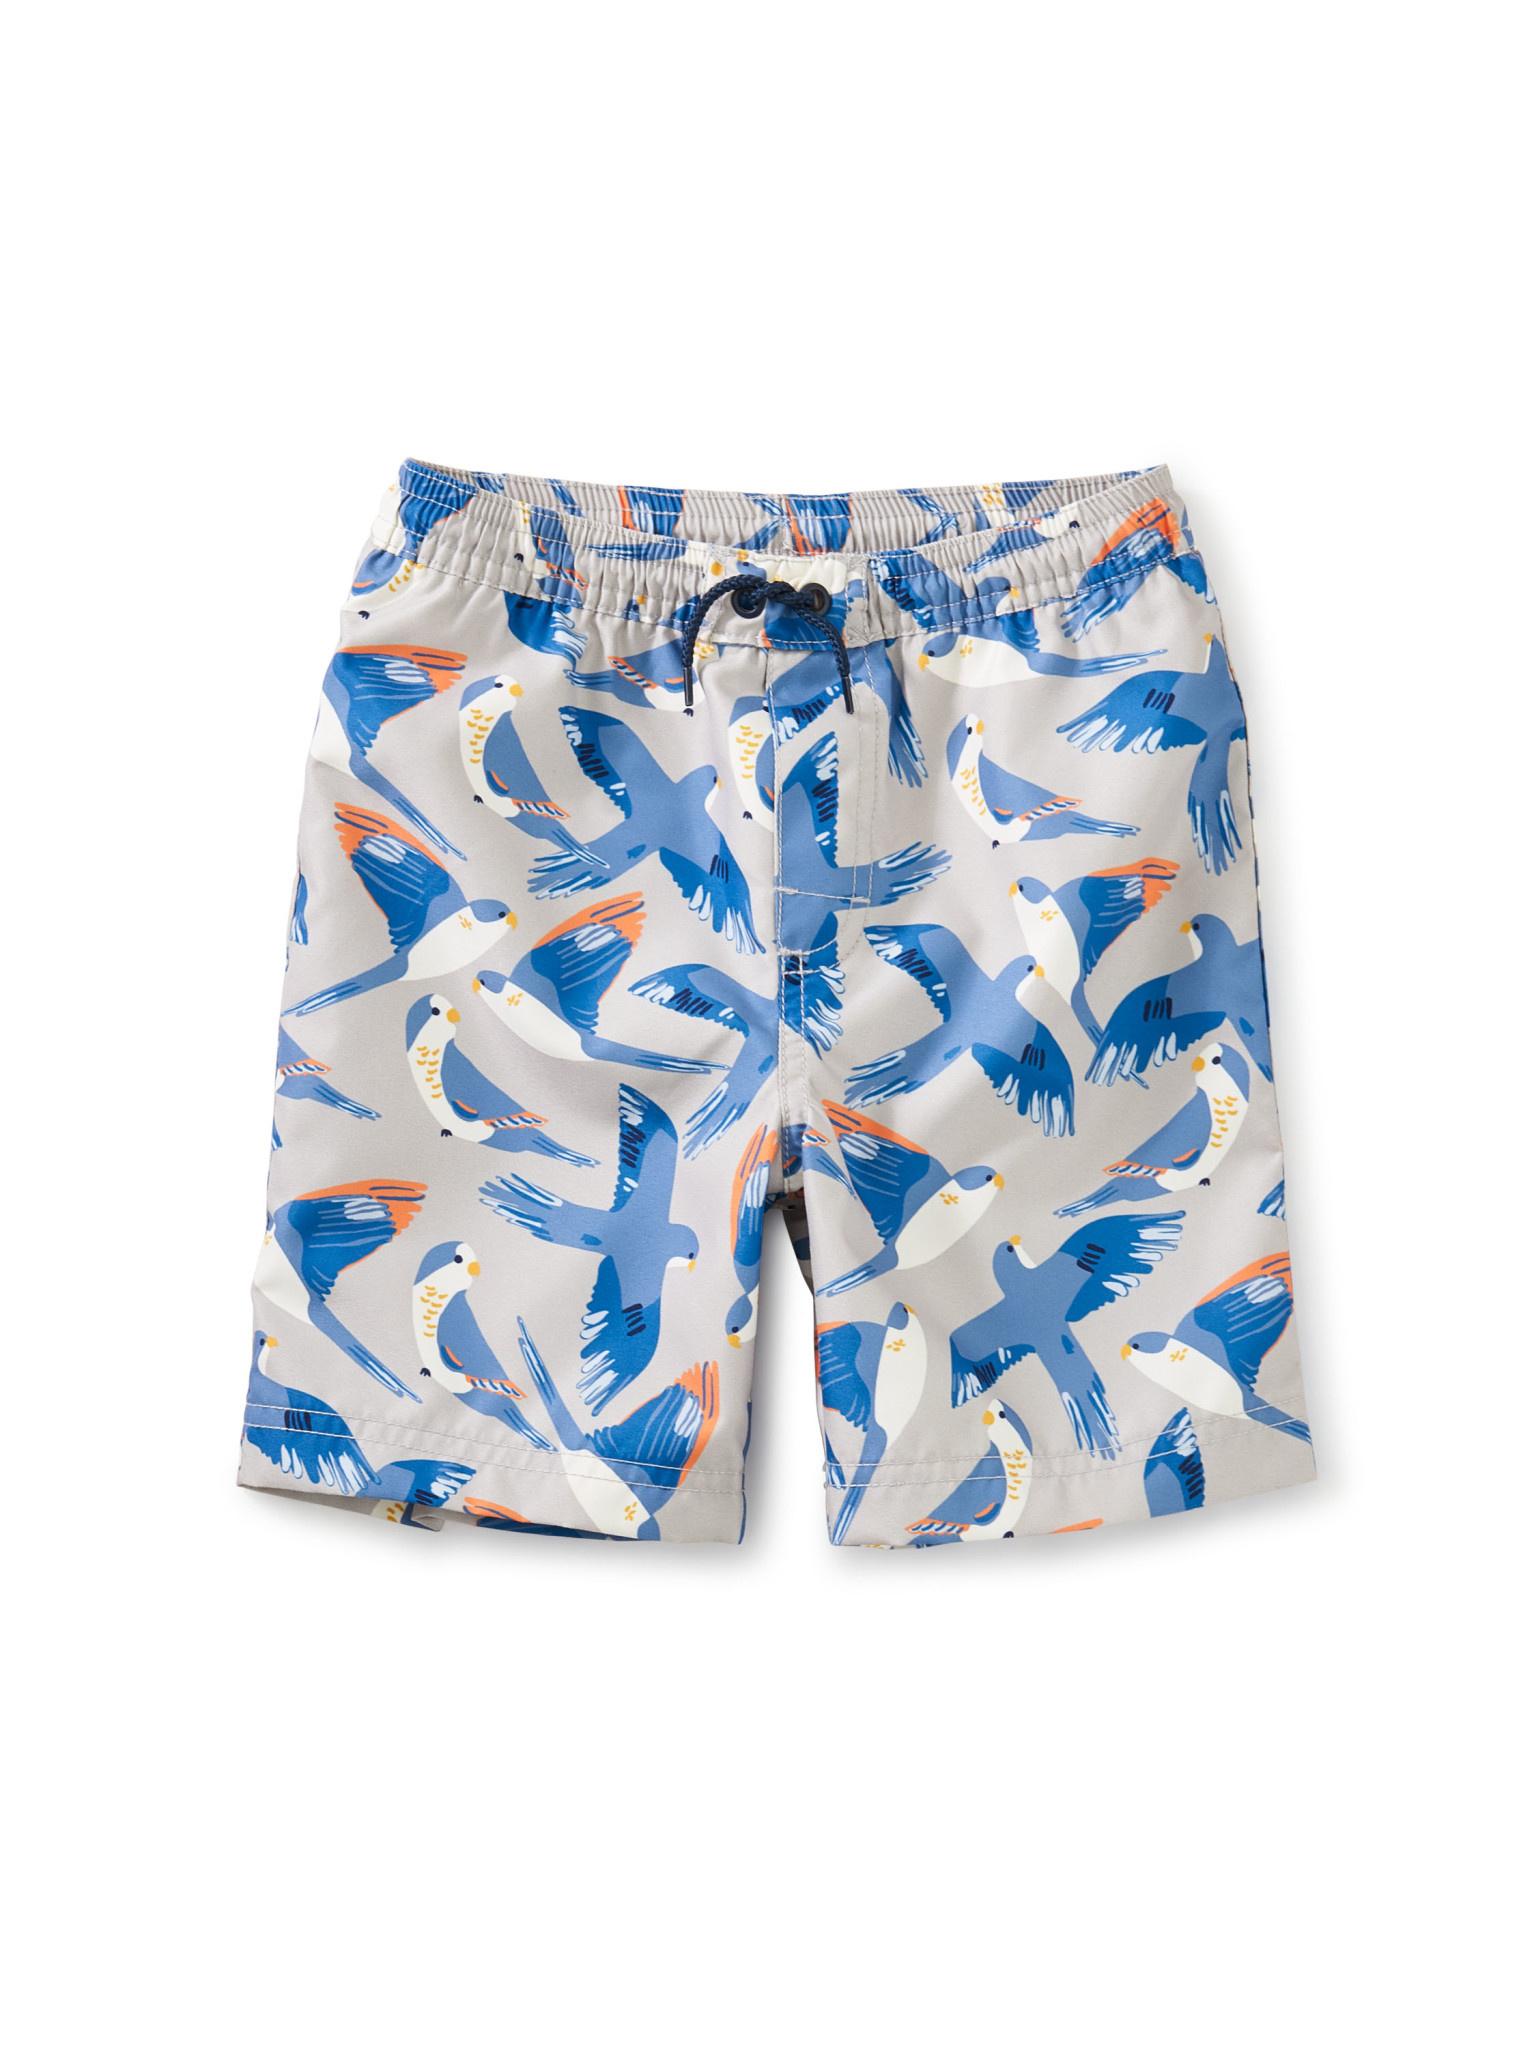 Tea Collection Full-Length Swim Trunk- Blue Birds